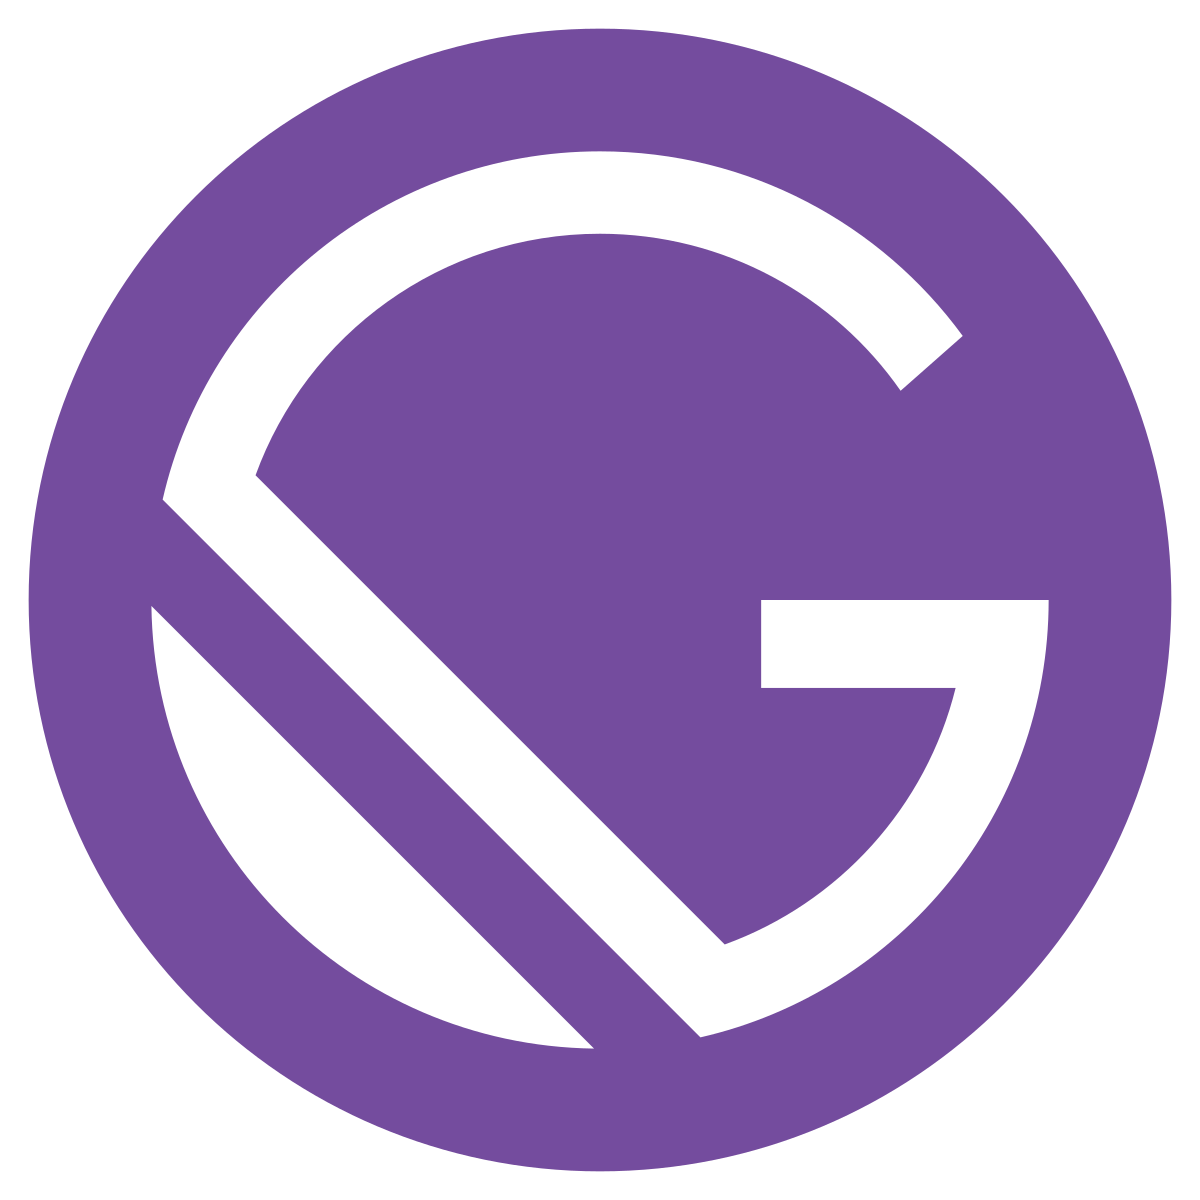 gatsby icon